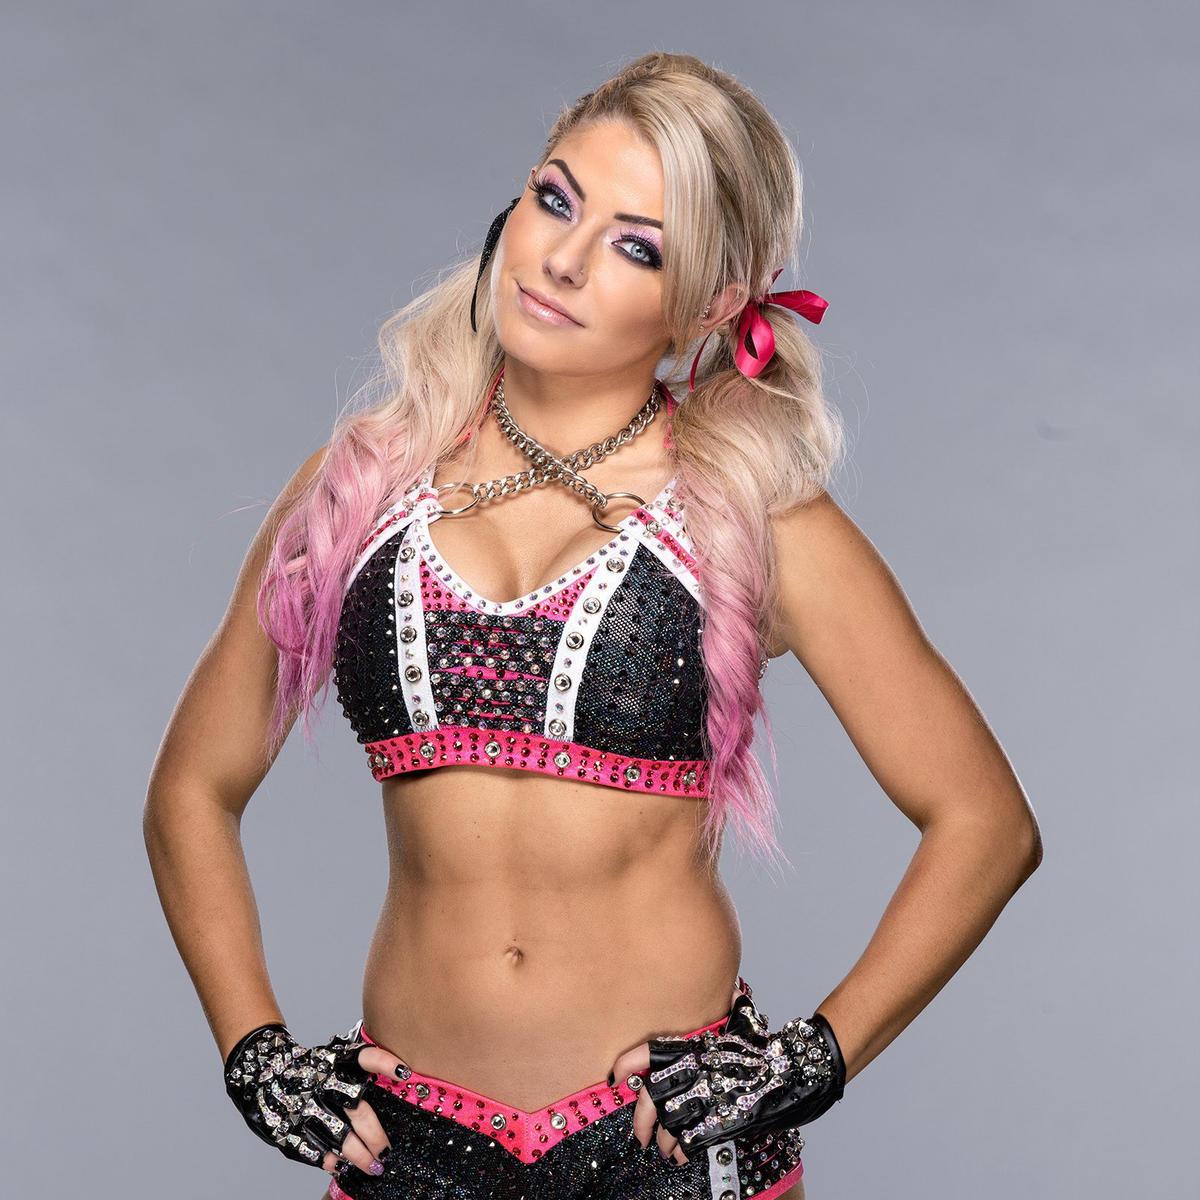 Alexa Bliss Birthday In Photos: WWE's Goddess Turns 29, Today 1